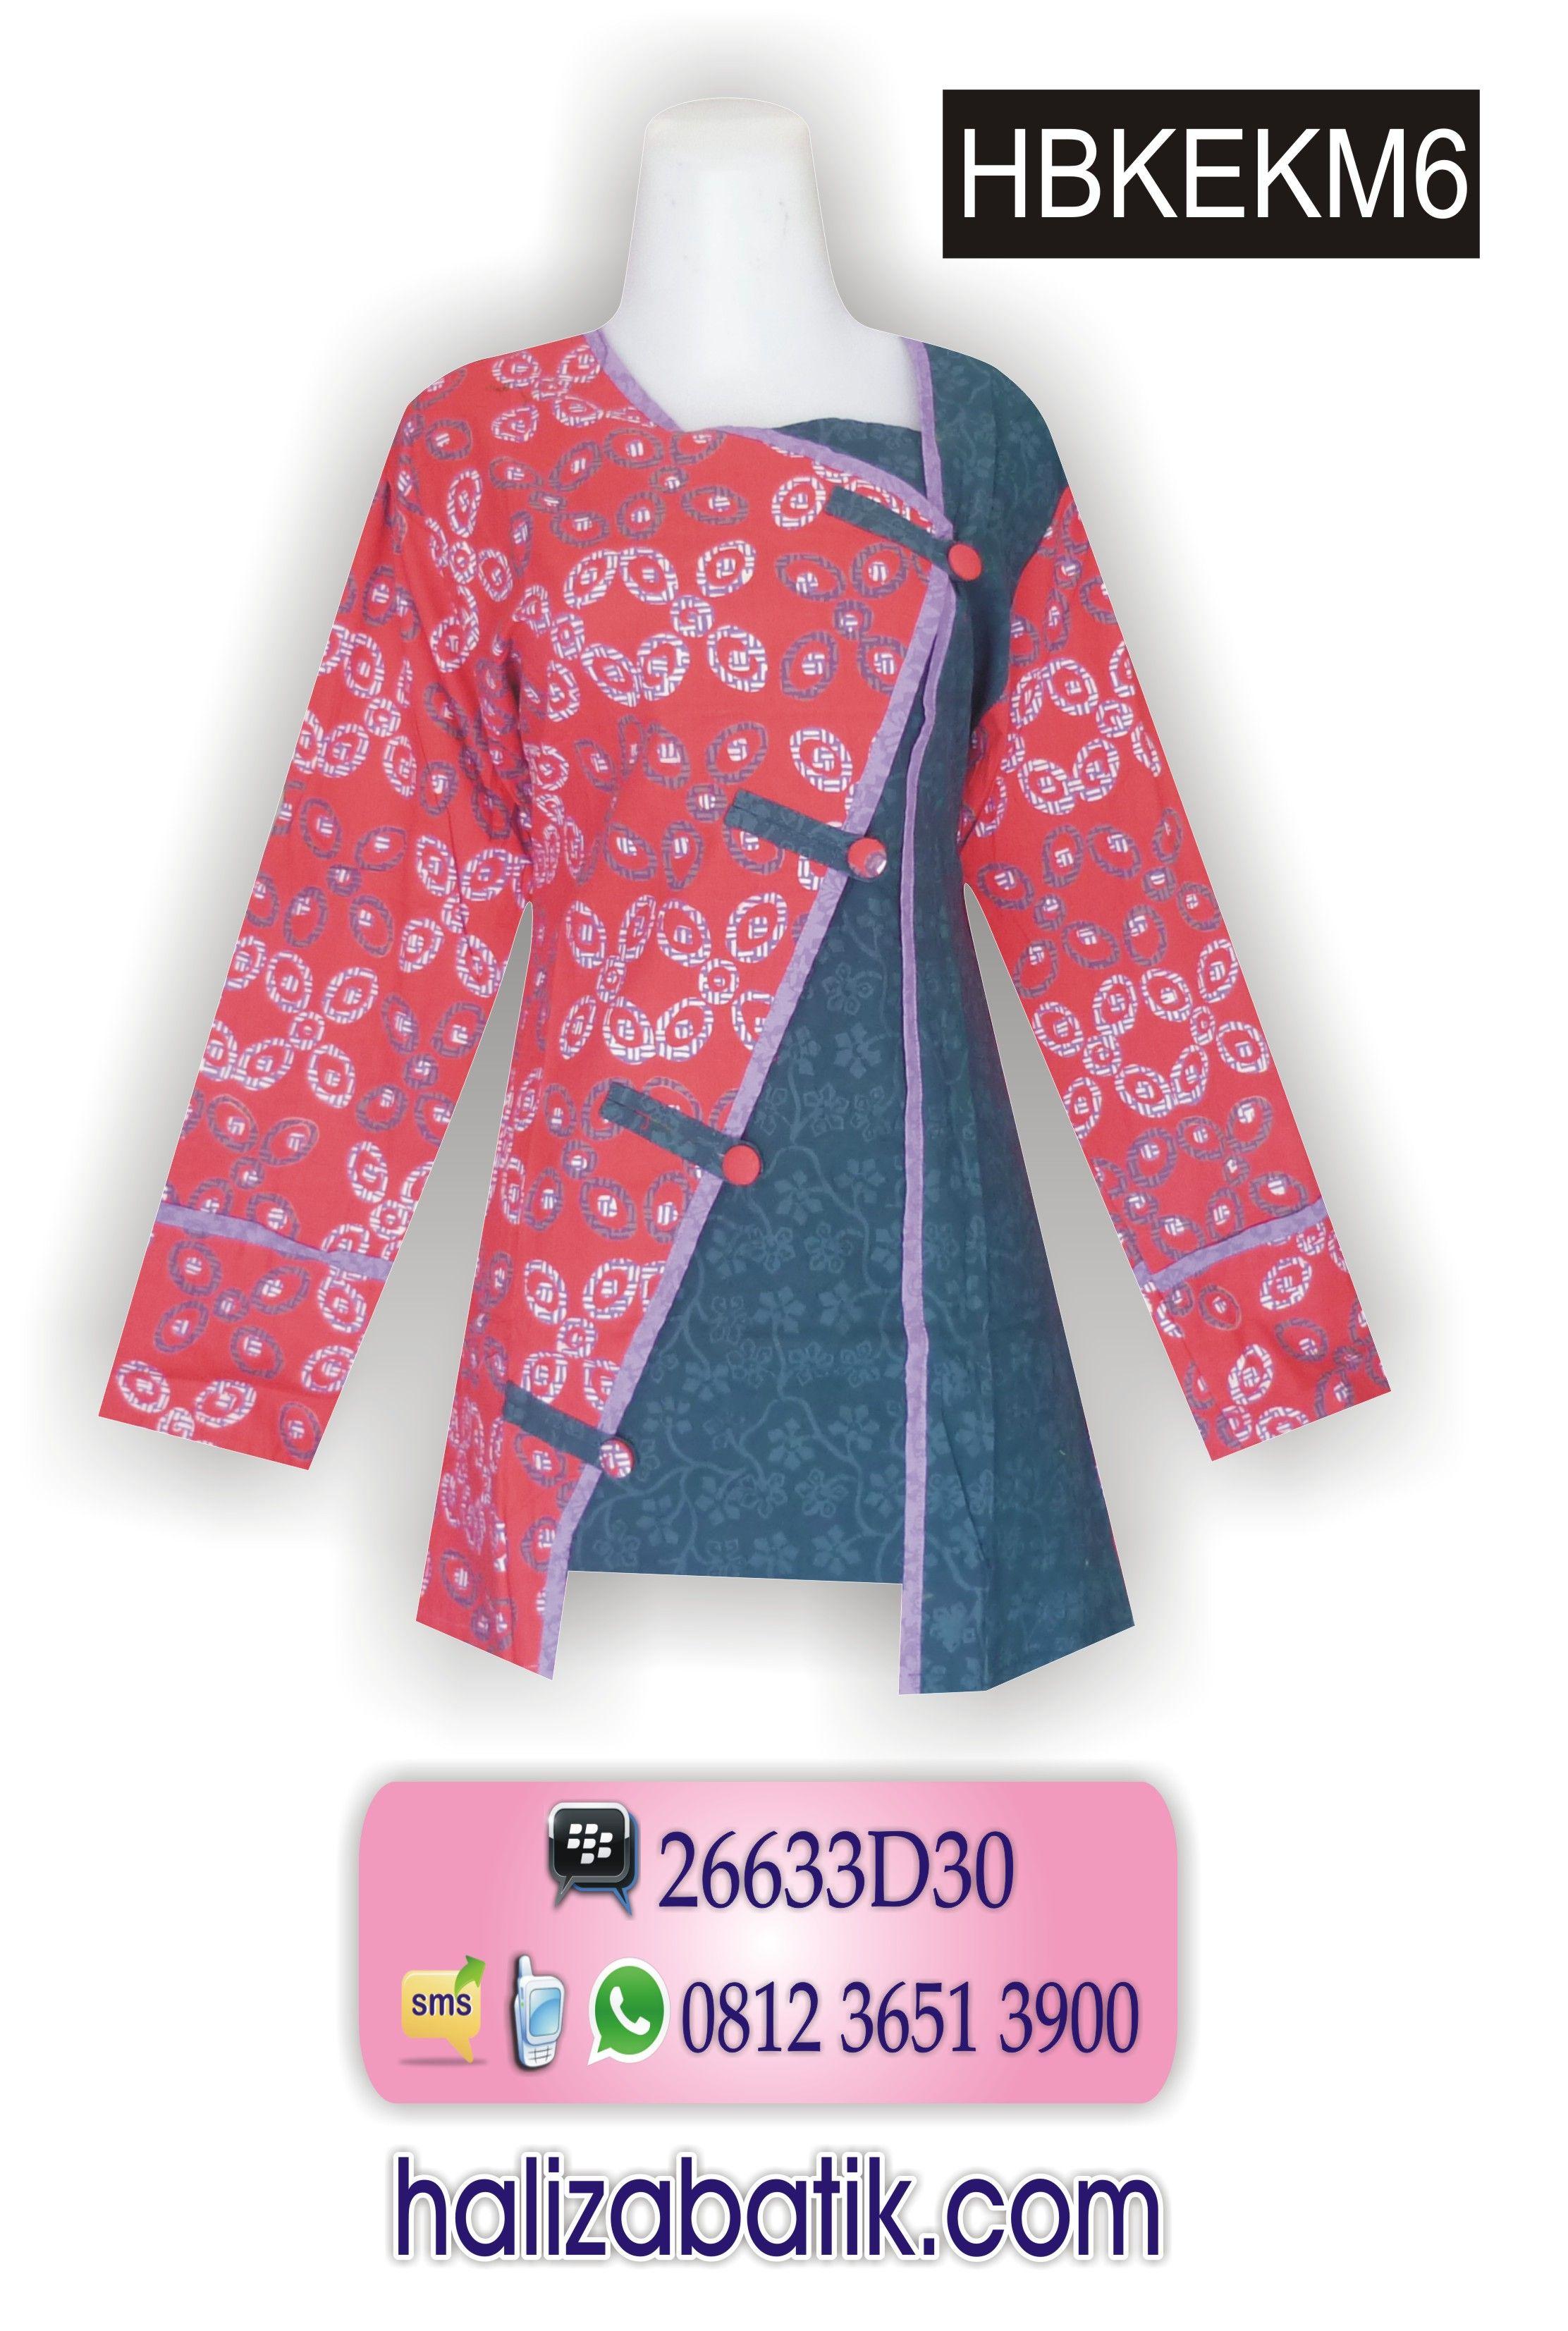 Baju Batik Desain Baju Batik Gambar Model Batik CS TOKO HALIZA BATIK SMS WA Follow IG halizabatik fashion Pinterest